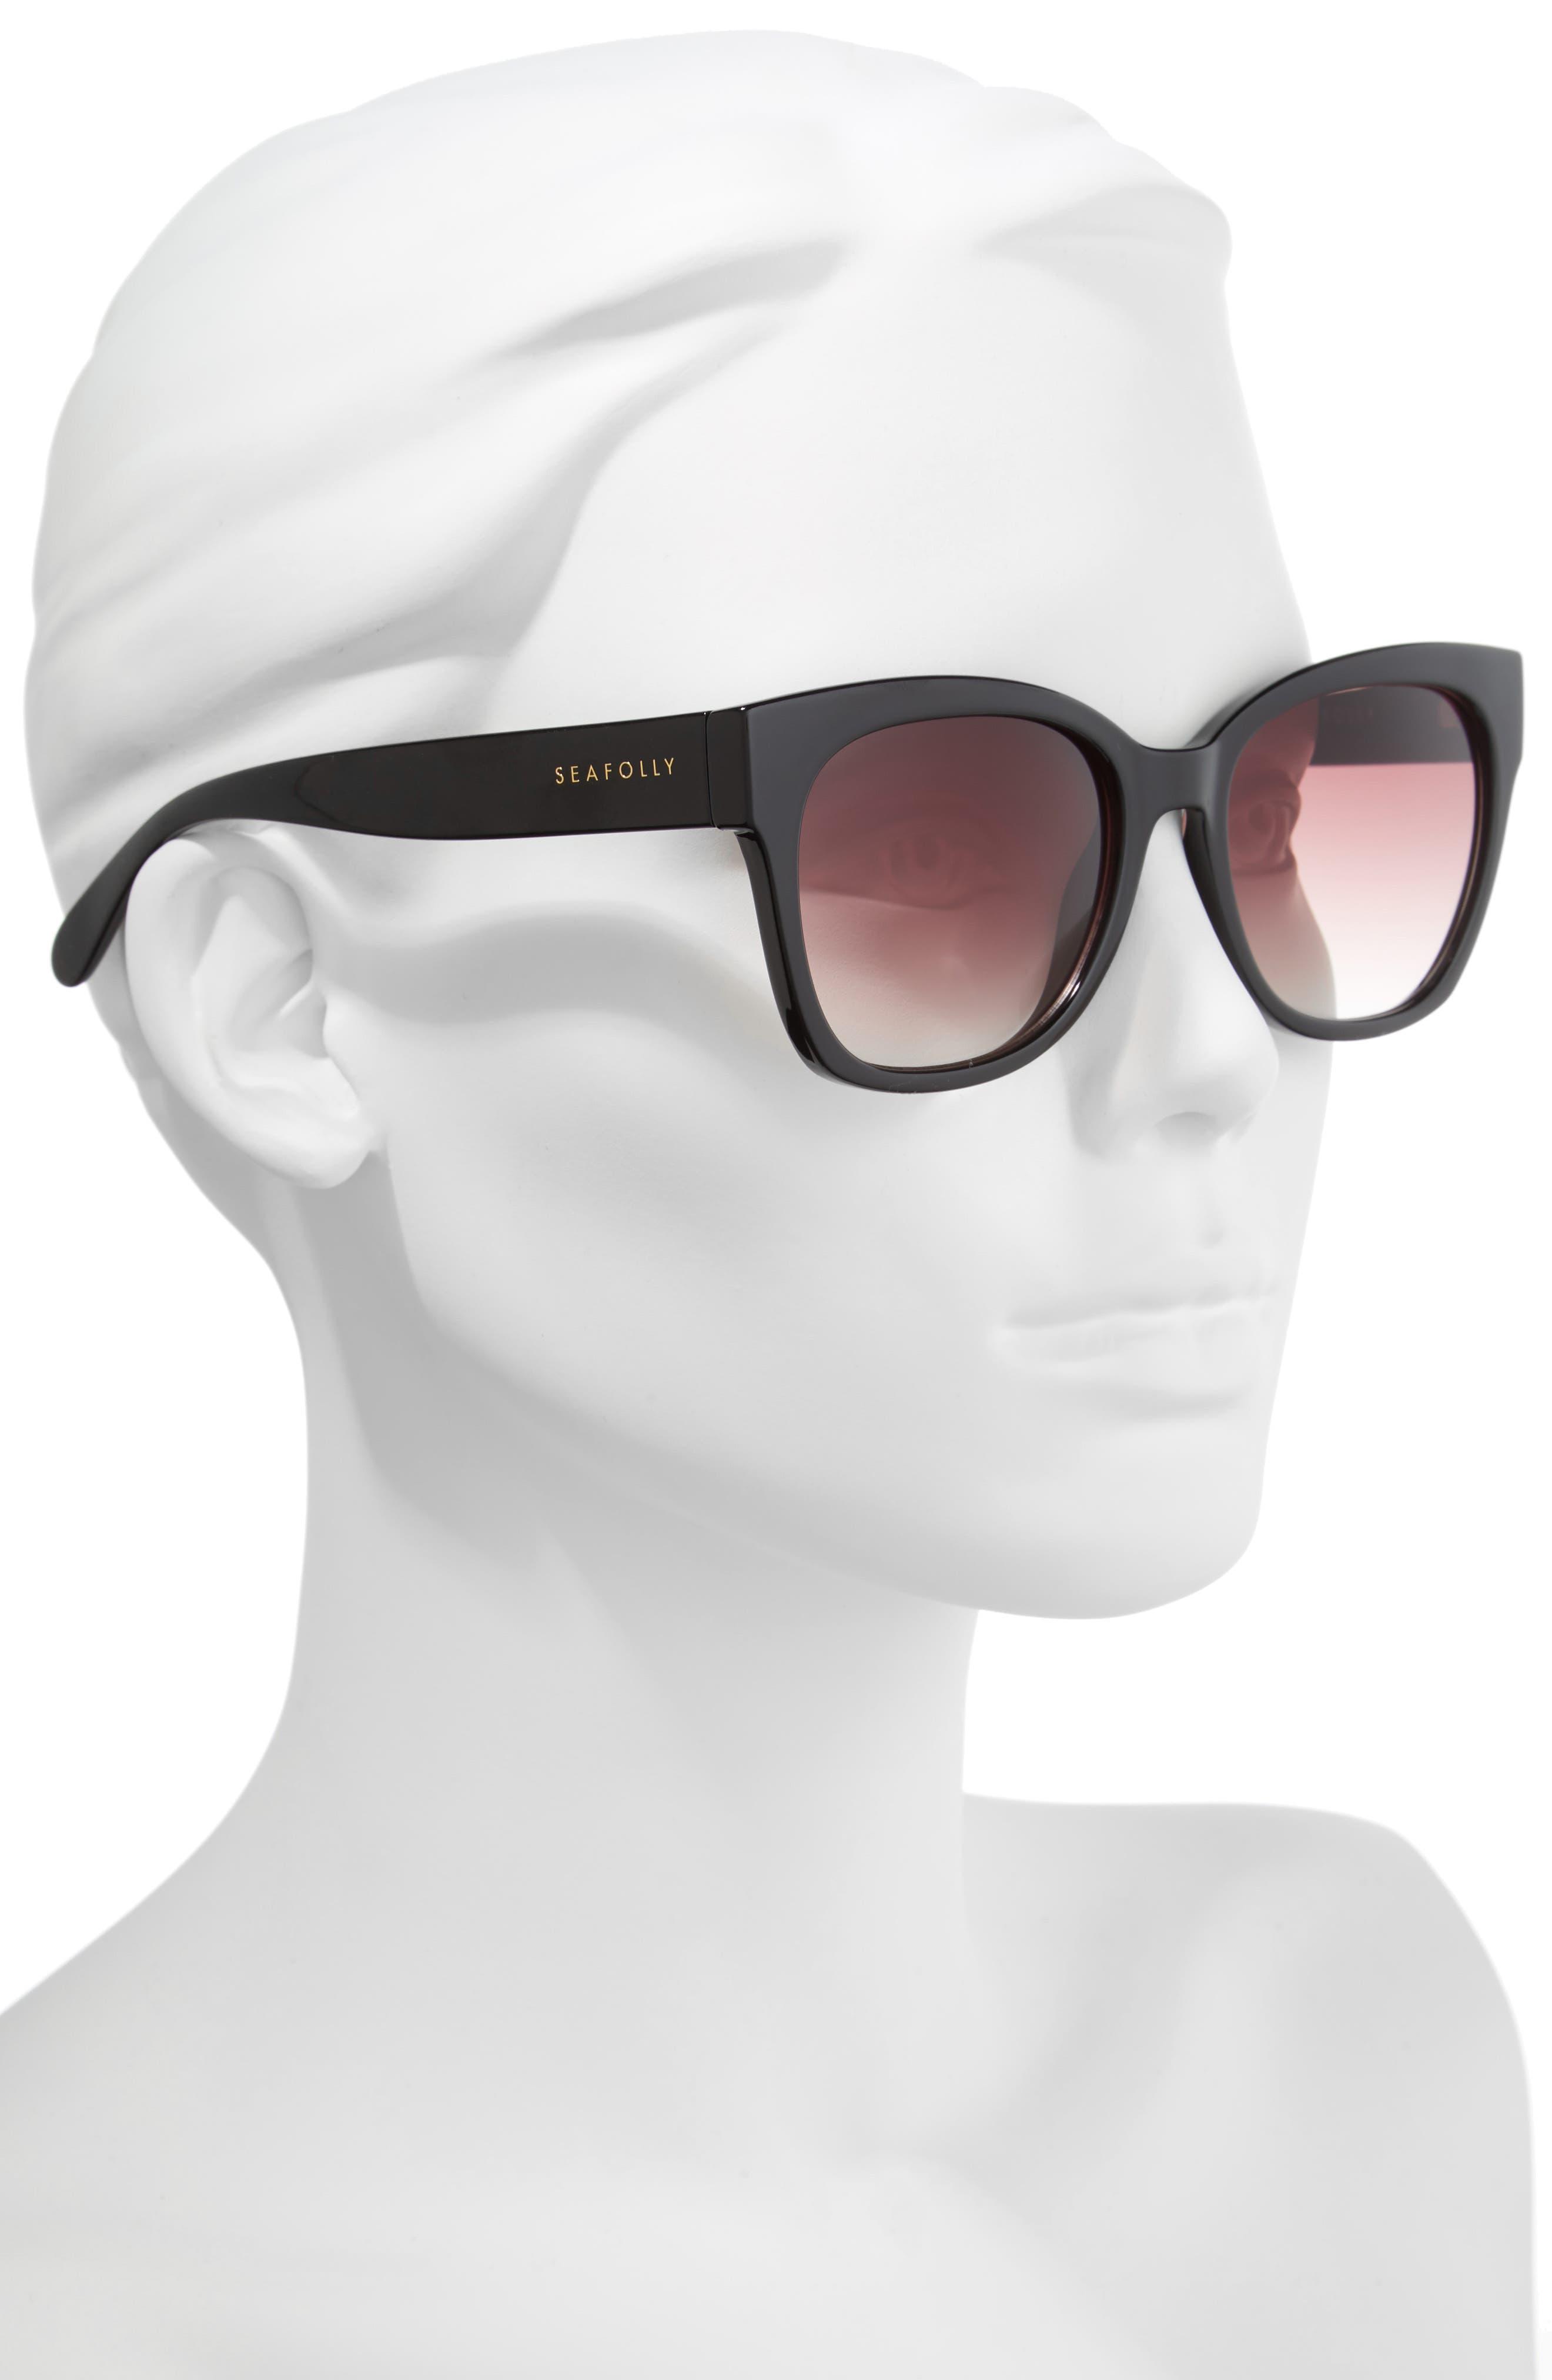 Summerland 55mm Cat Eye Sunglasses,                             Alternate thumbnail 2, color,                             BLACK